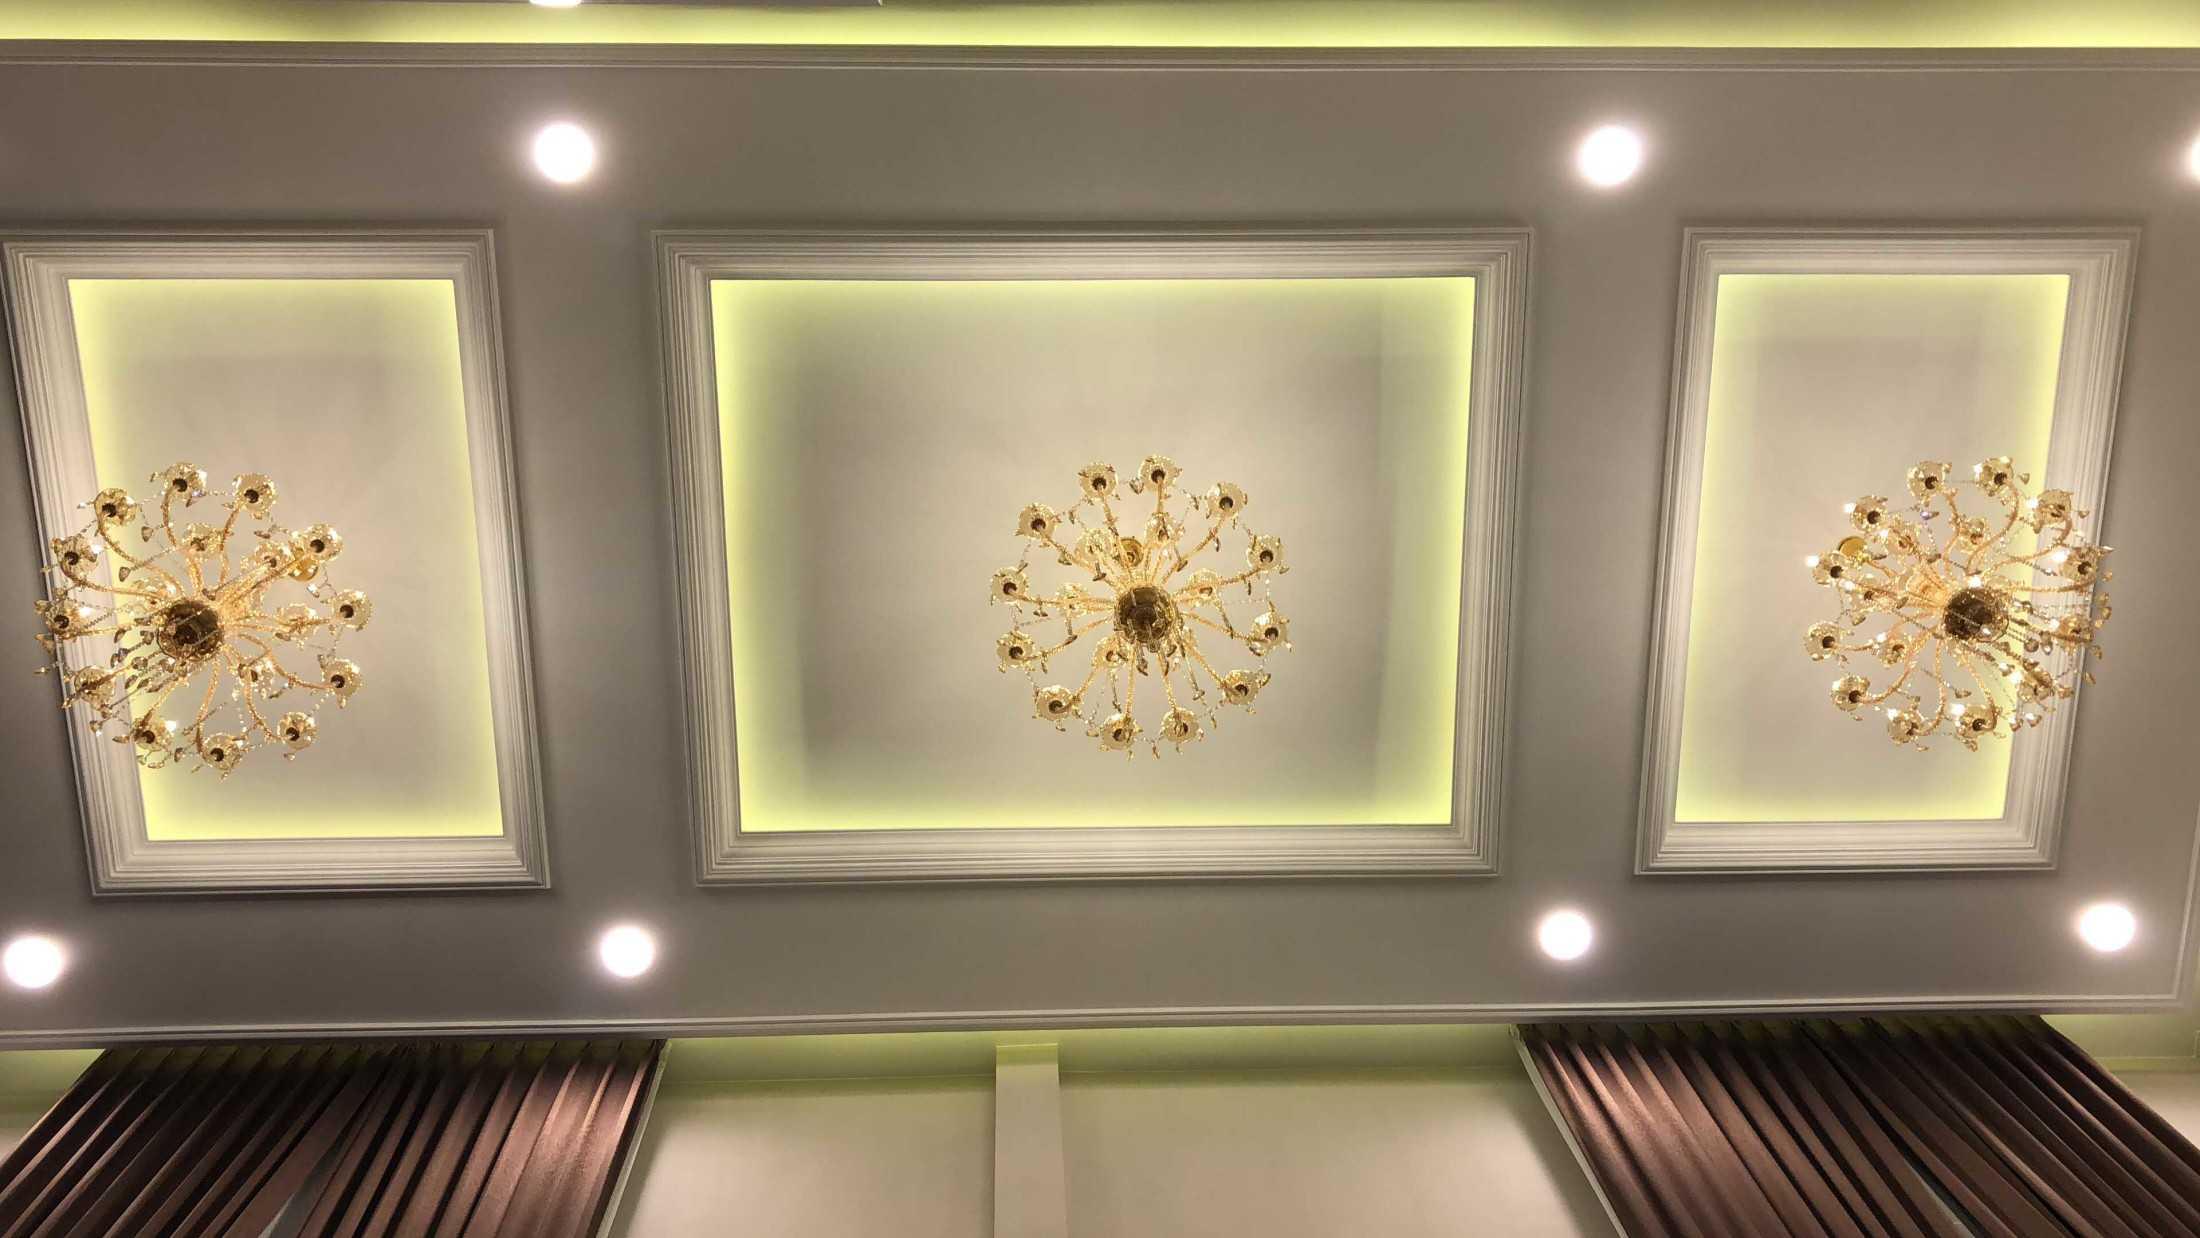 Pt. Leeyaqat Karya Pratama Design & Build Lot – 15347 Brunei Darussalam Brunei Darussalam Pt-Leeyaqat-Karya-Pratama-Design-Build-Lot-15347  63658